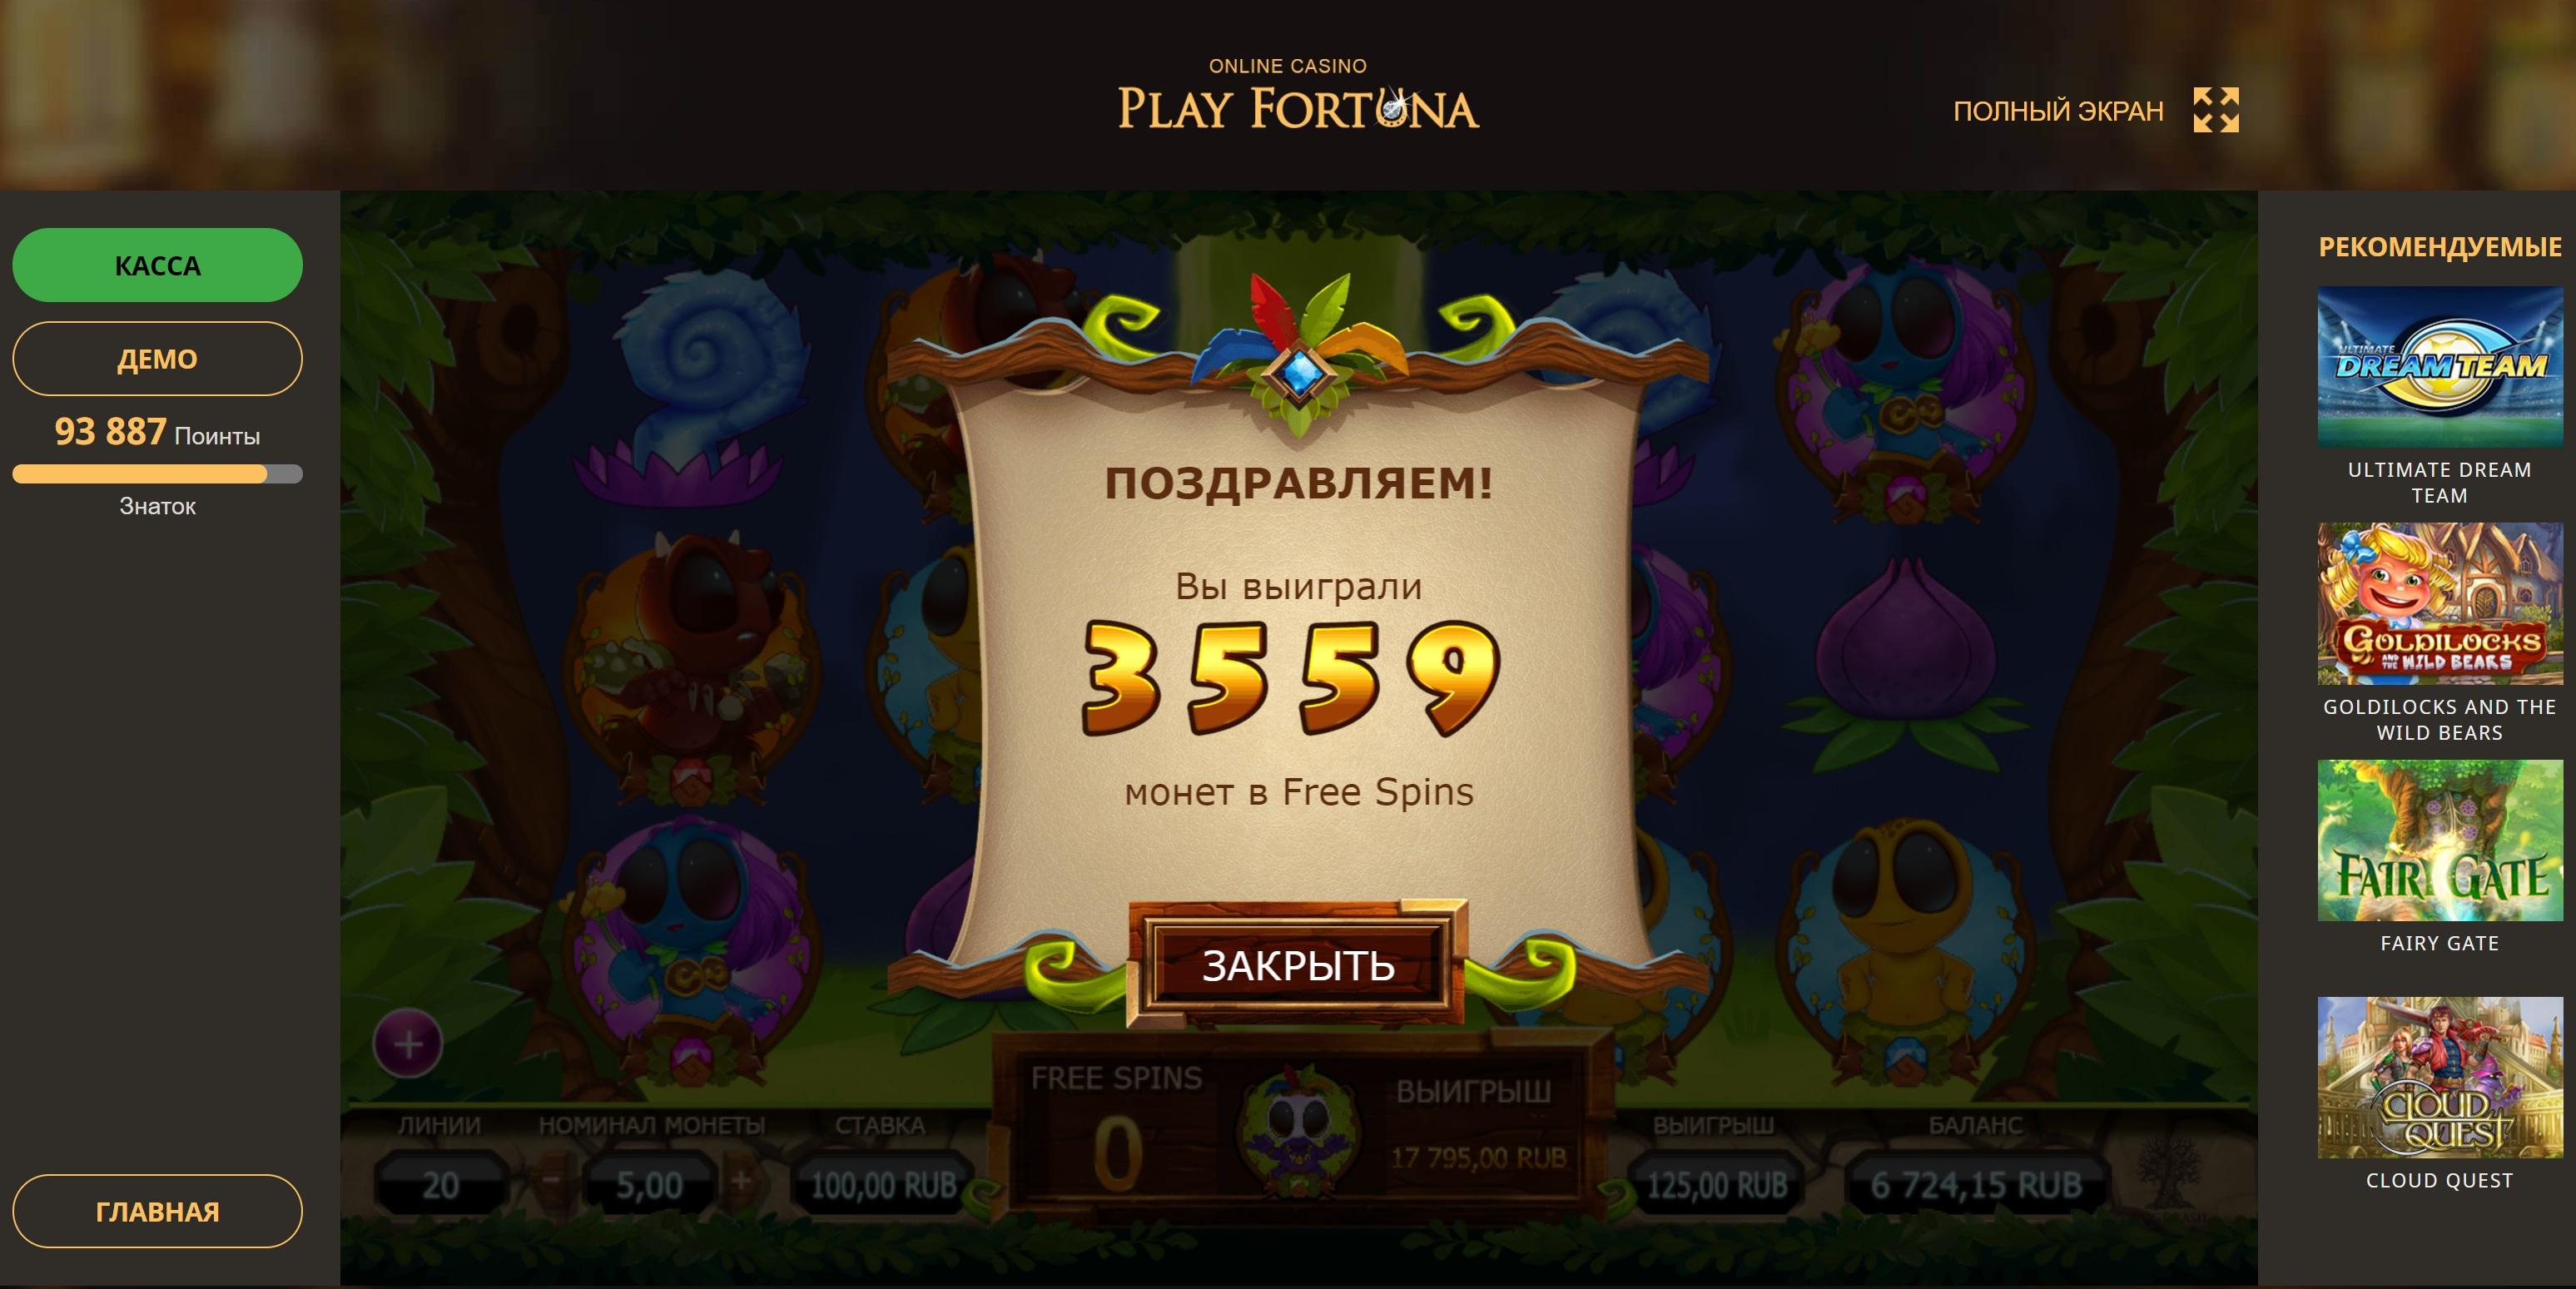 play fortuna slot1m